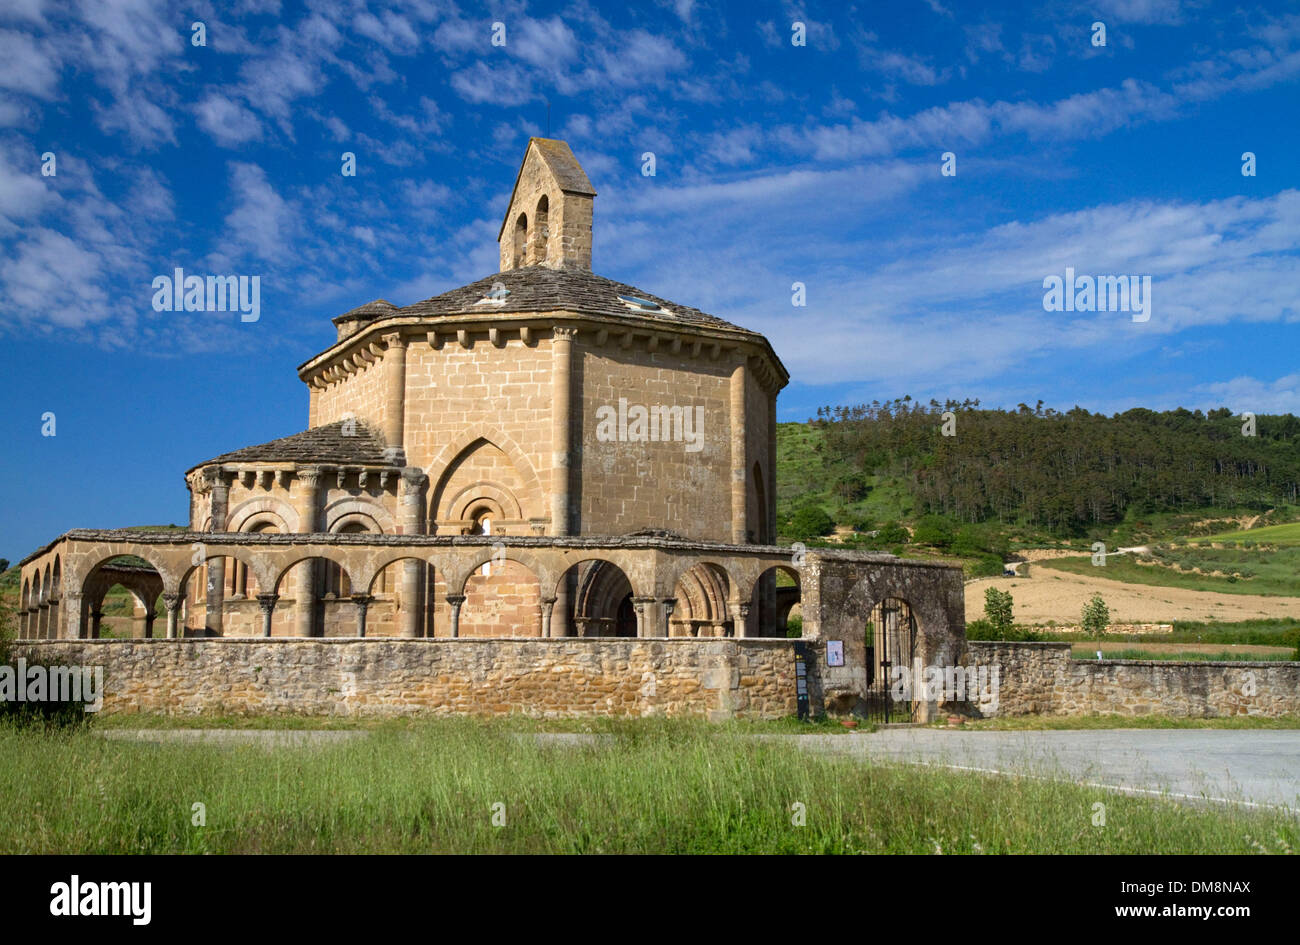 Church of Saint Mary of Eunate along the Camino De Santiago, the Way of St. James pilgrimage route, Navarra, Spain. - Stock Image